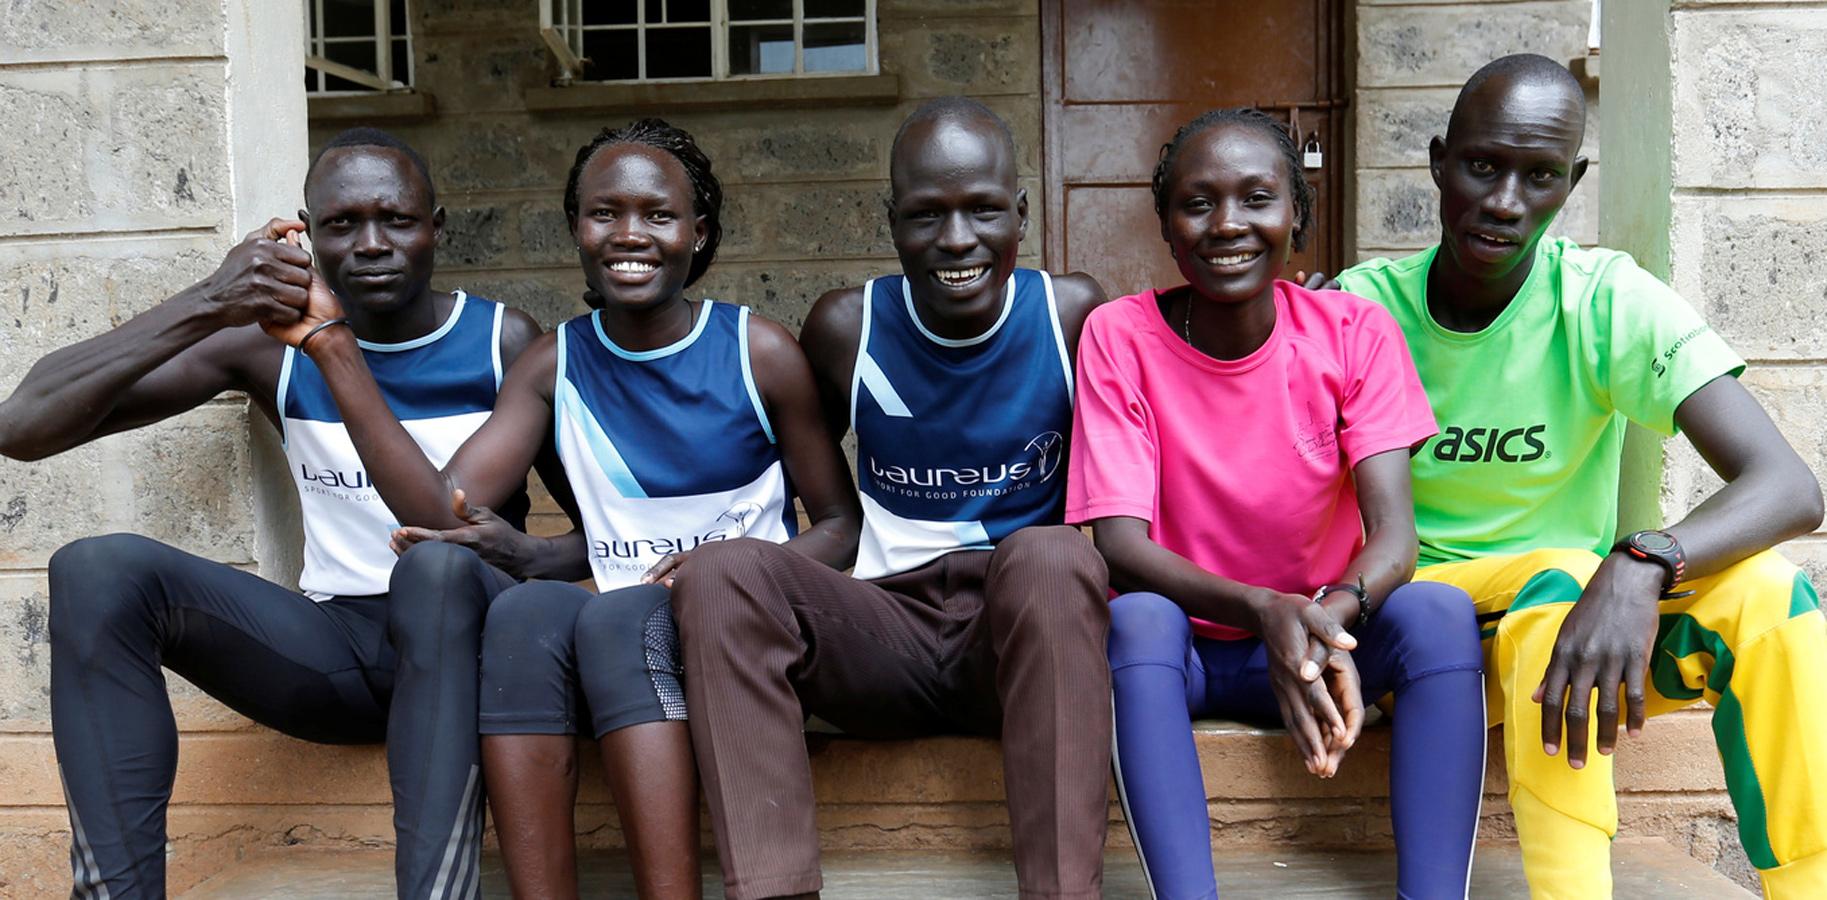 Athletes from South Sudan, (L-R) Paulo Amotun Lokoro of 1500m, Rose Nathike Lokonyen of 800m, Yiech Pur Biel of 800m, Anjelina Nada Lohalith of 1500m and James Nyang Chiengjiek of 400m | Source: Thomas Mukoya/REUTERS